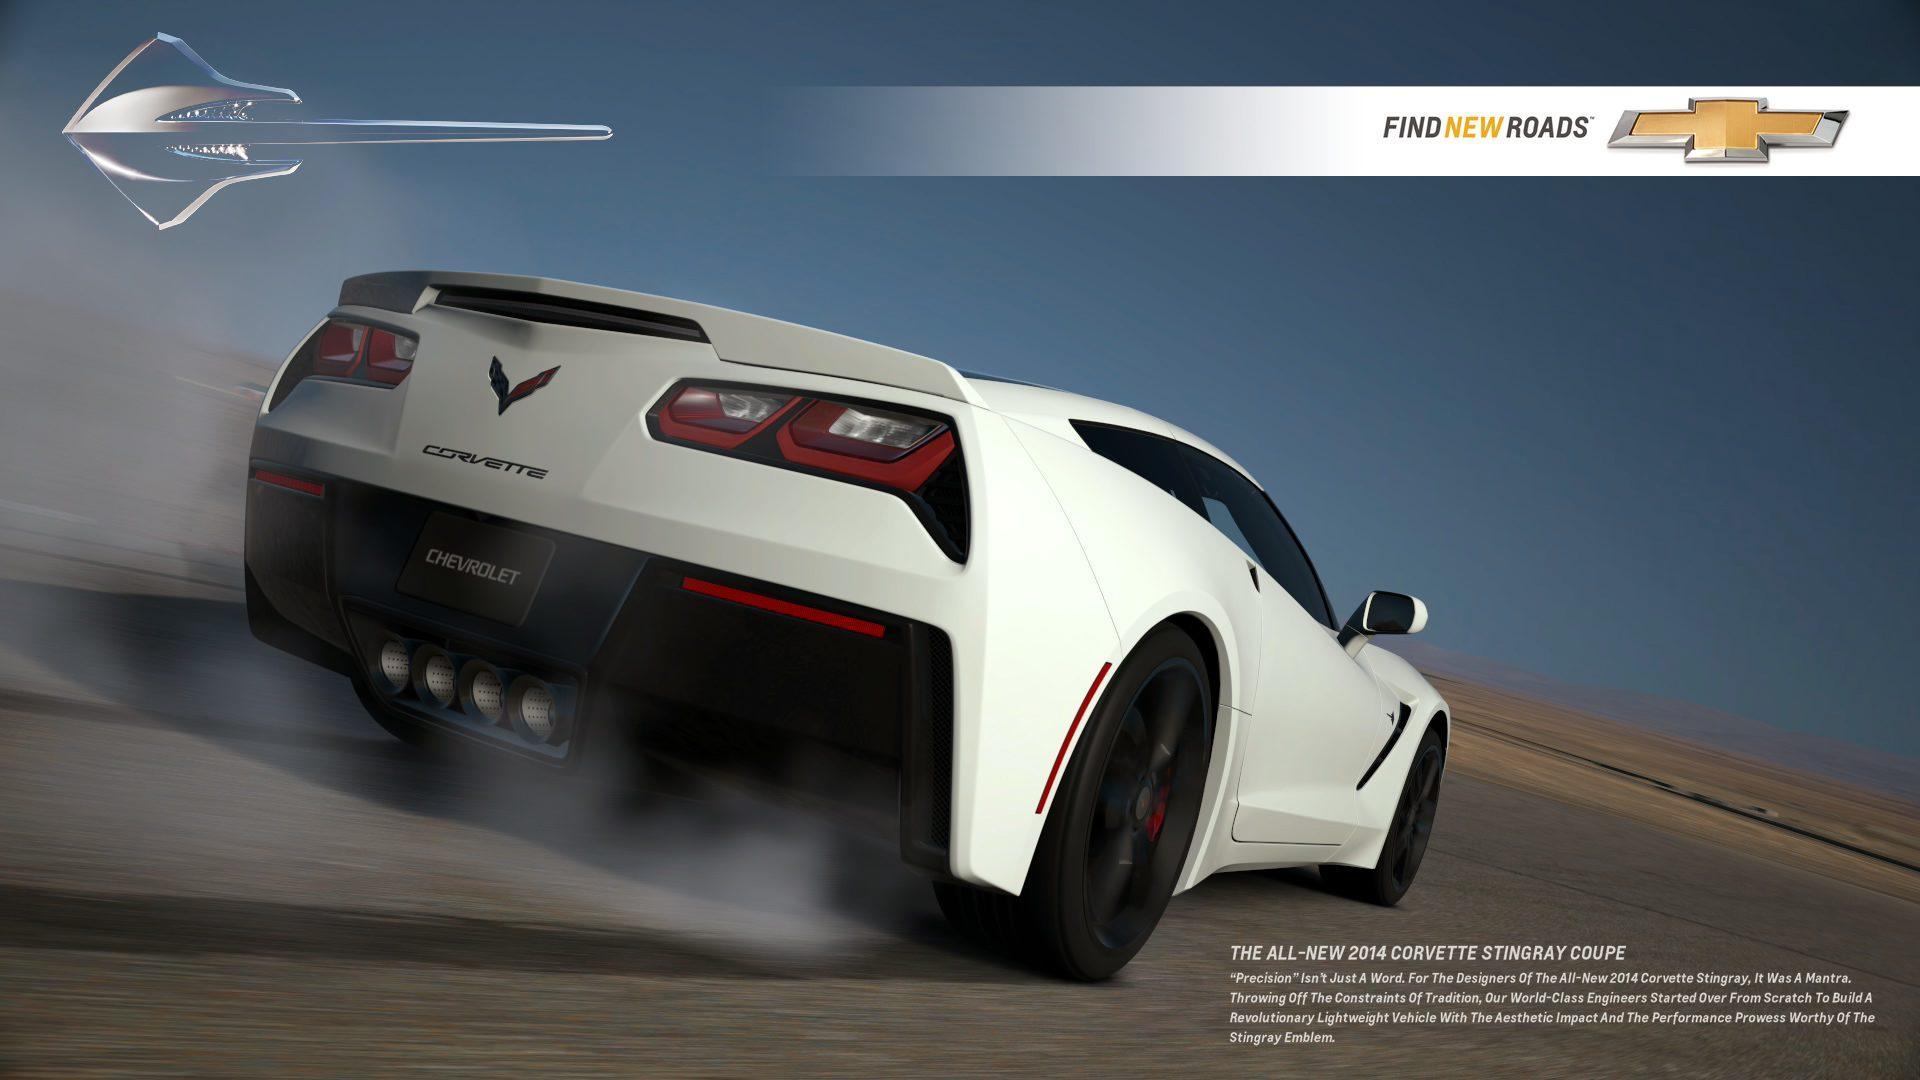 2014 Stingray Ad 1.jpg